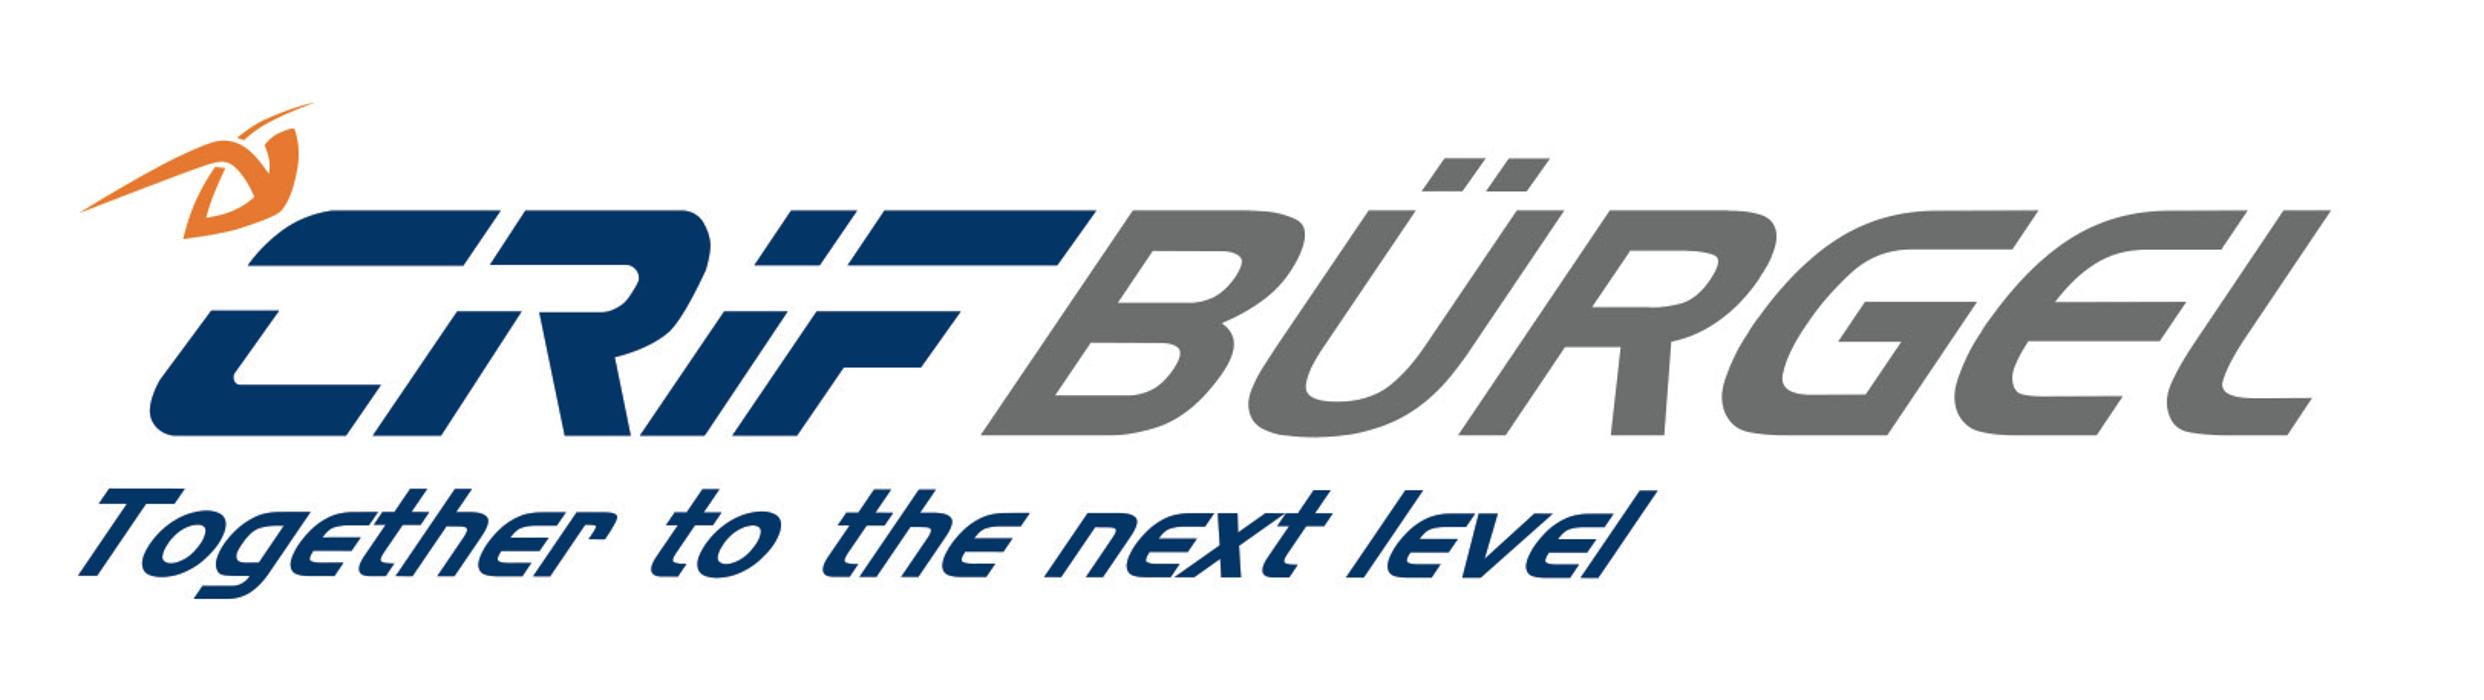 Bild zu CRIF Bürgel Dortmund GmbH & Co. KG in Dortmund